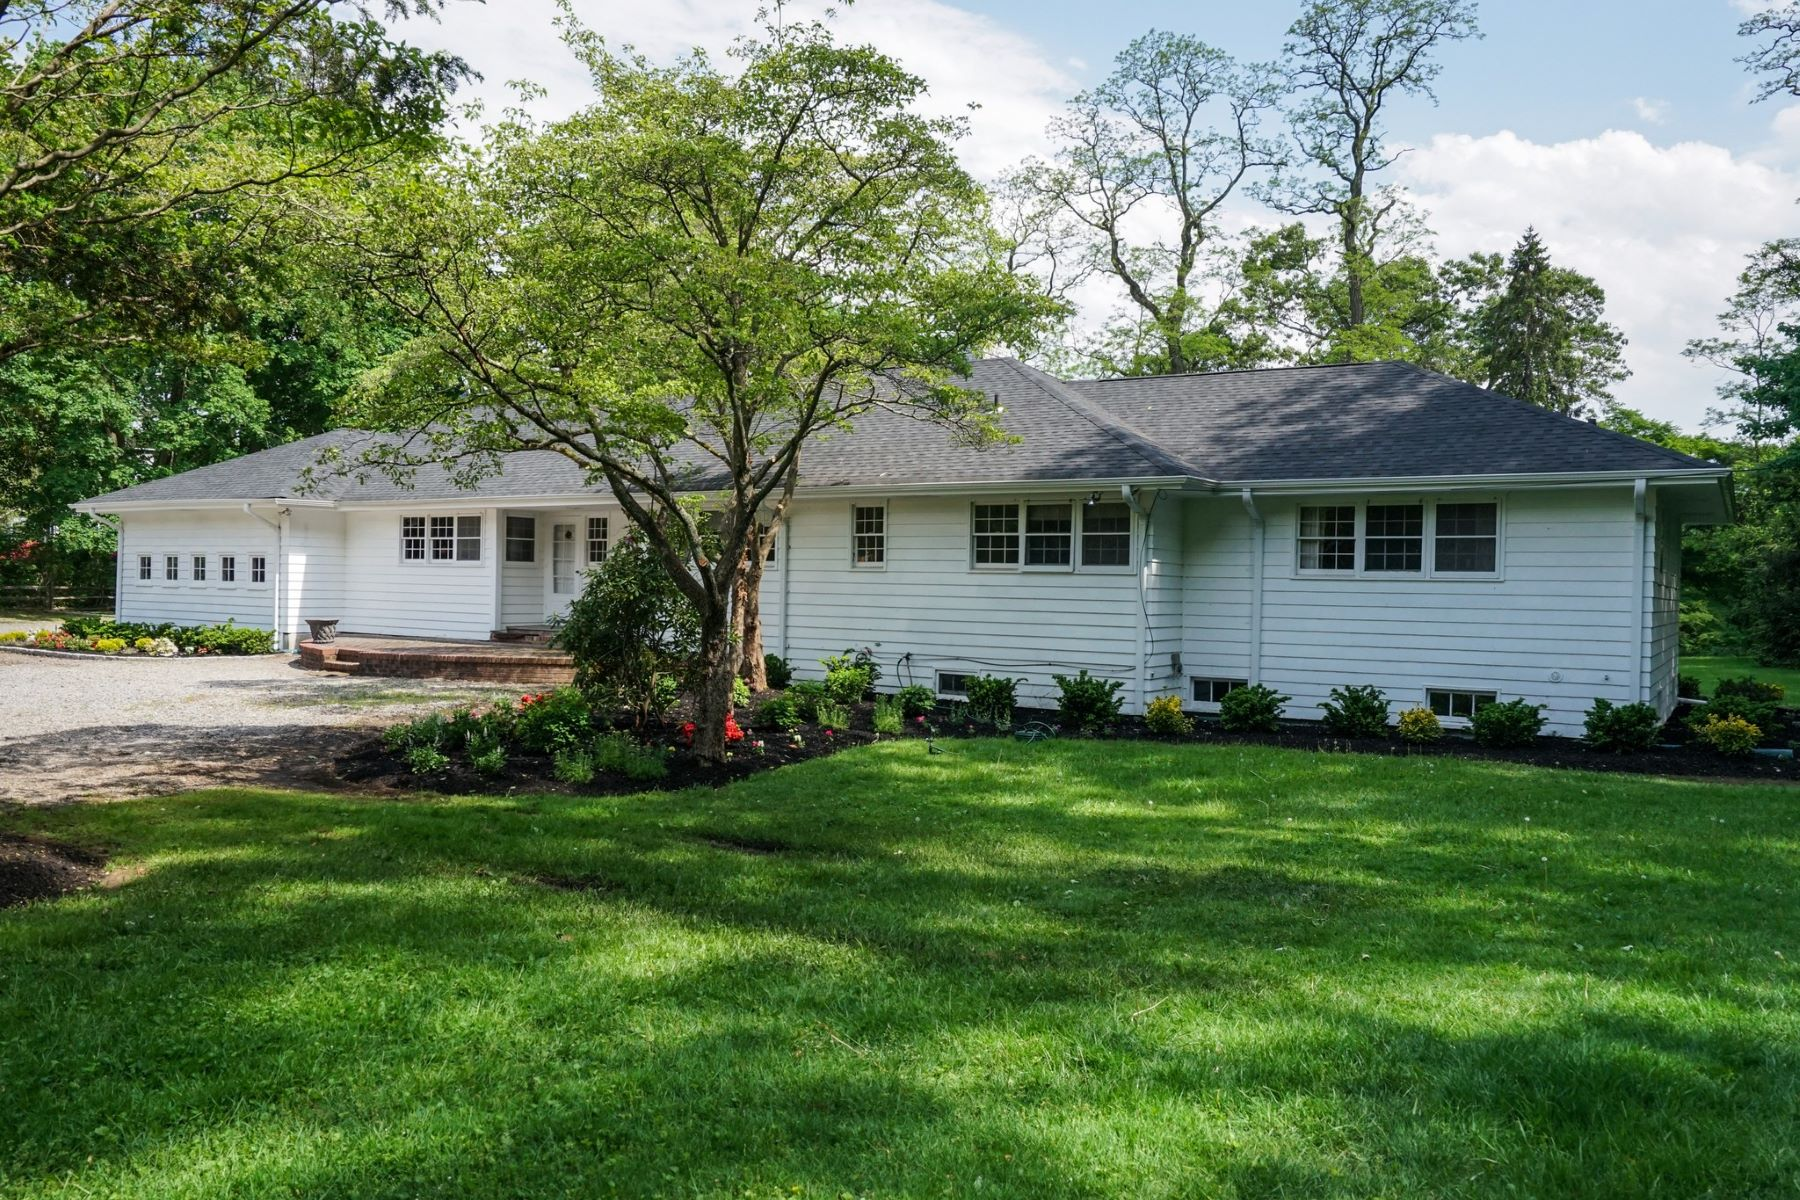 Single Family Homes for Sale at Lattingtown 156 Feeks Lane Lattingtown, New York 11560 United States